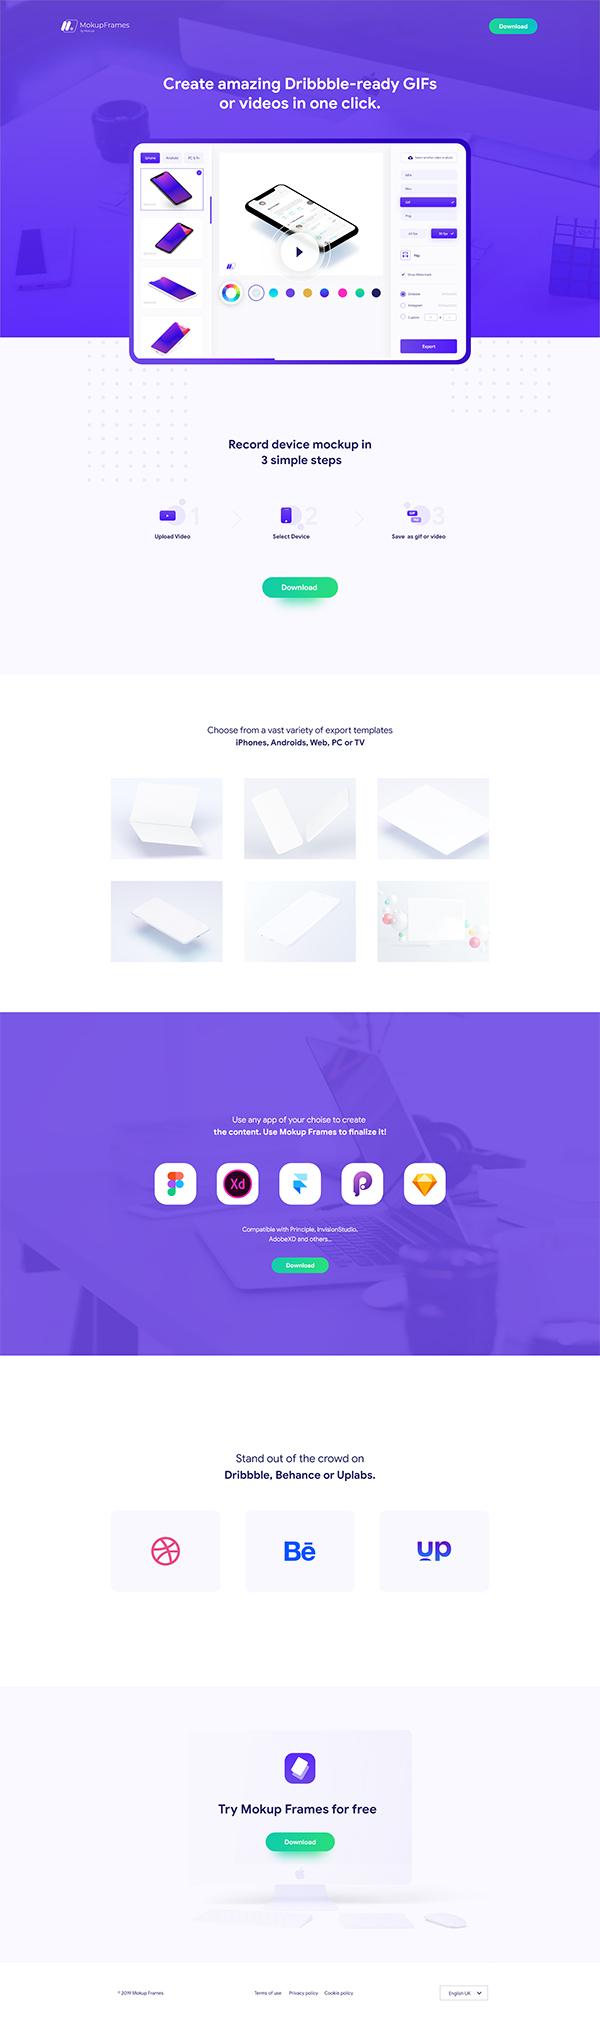 Mokupframes Landing Page and App Design